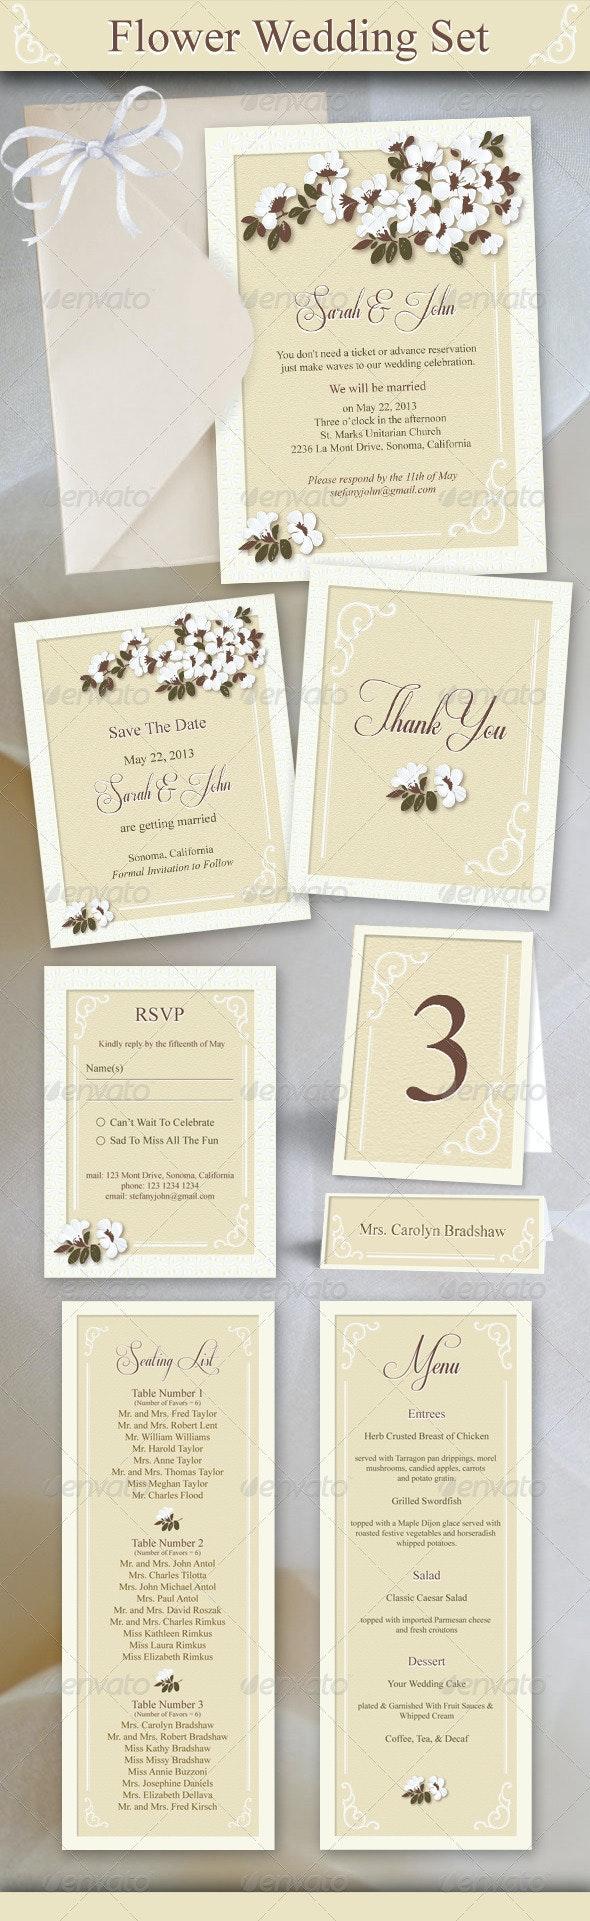 Flower Wedding Set - Weddings Cards & Invites